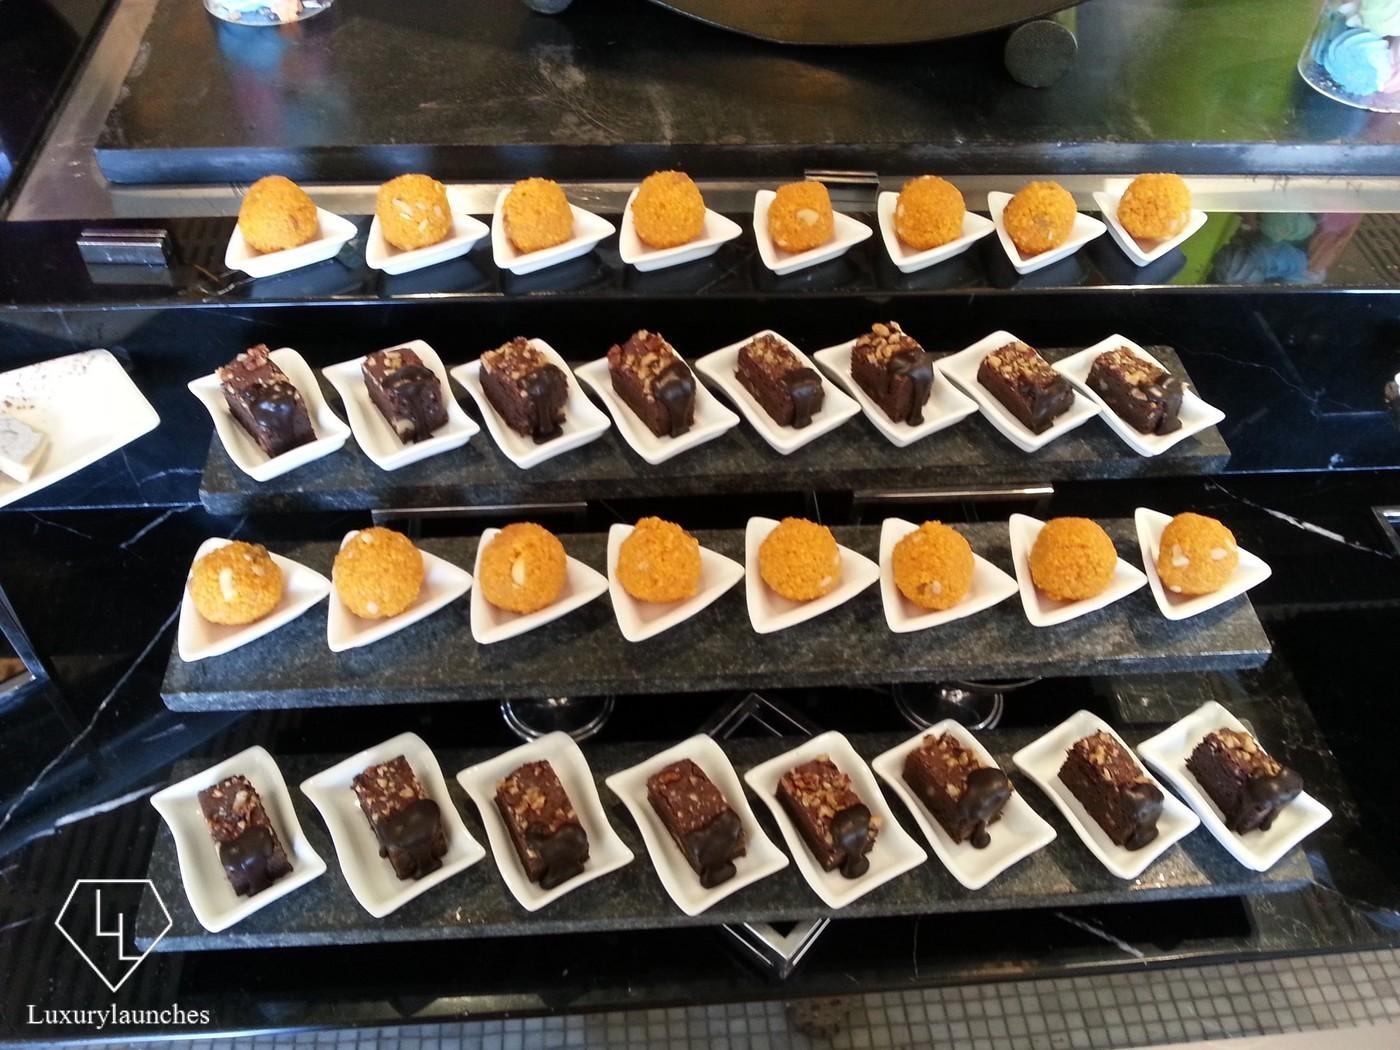 Desserts in the Latest Recipe buffet